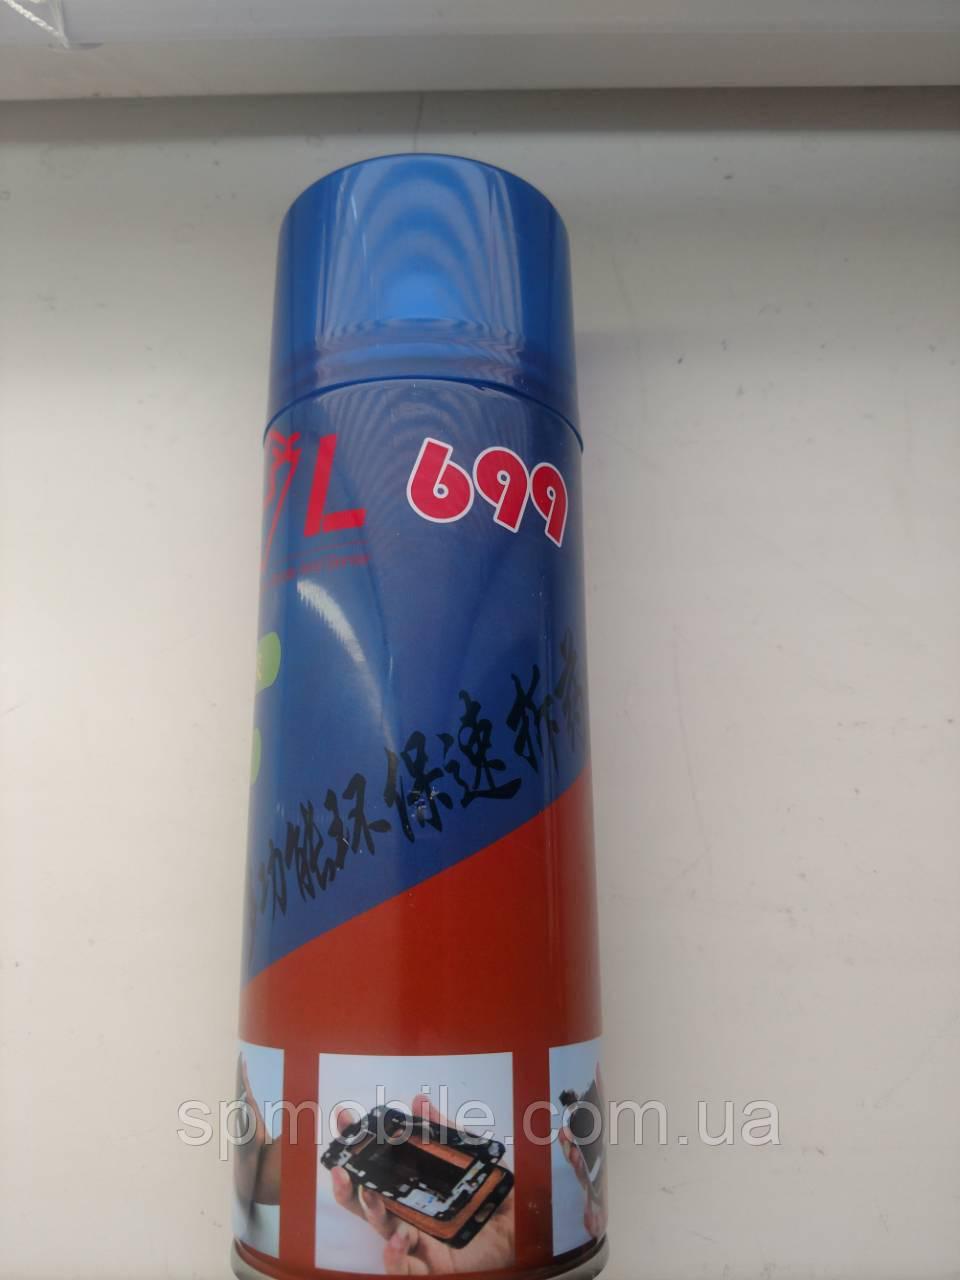 Спрей для разделения дисплея от рамки, CSL 699,400 ml